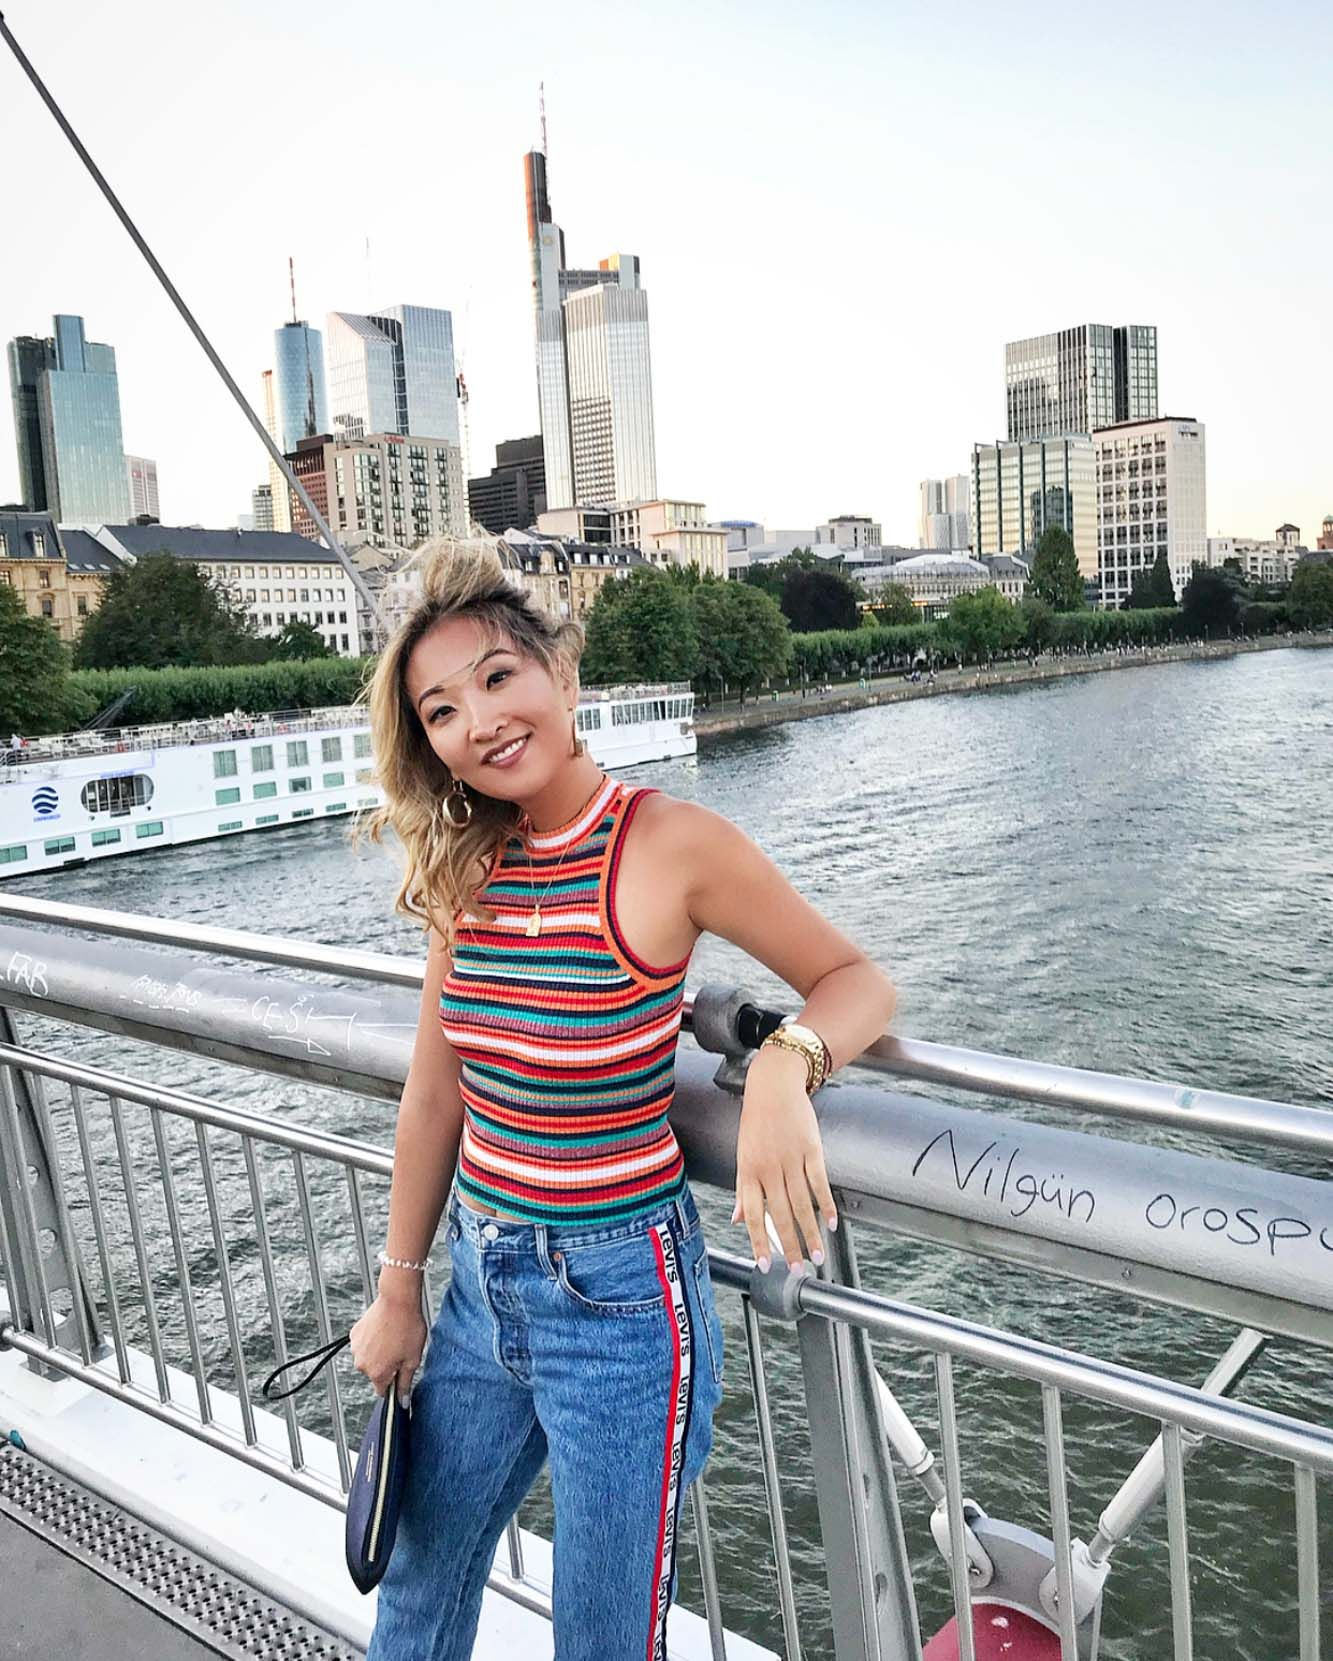 Frankfurt Germany, U by Uniworld